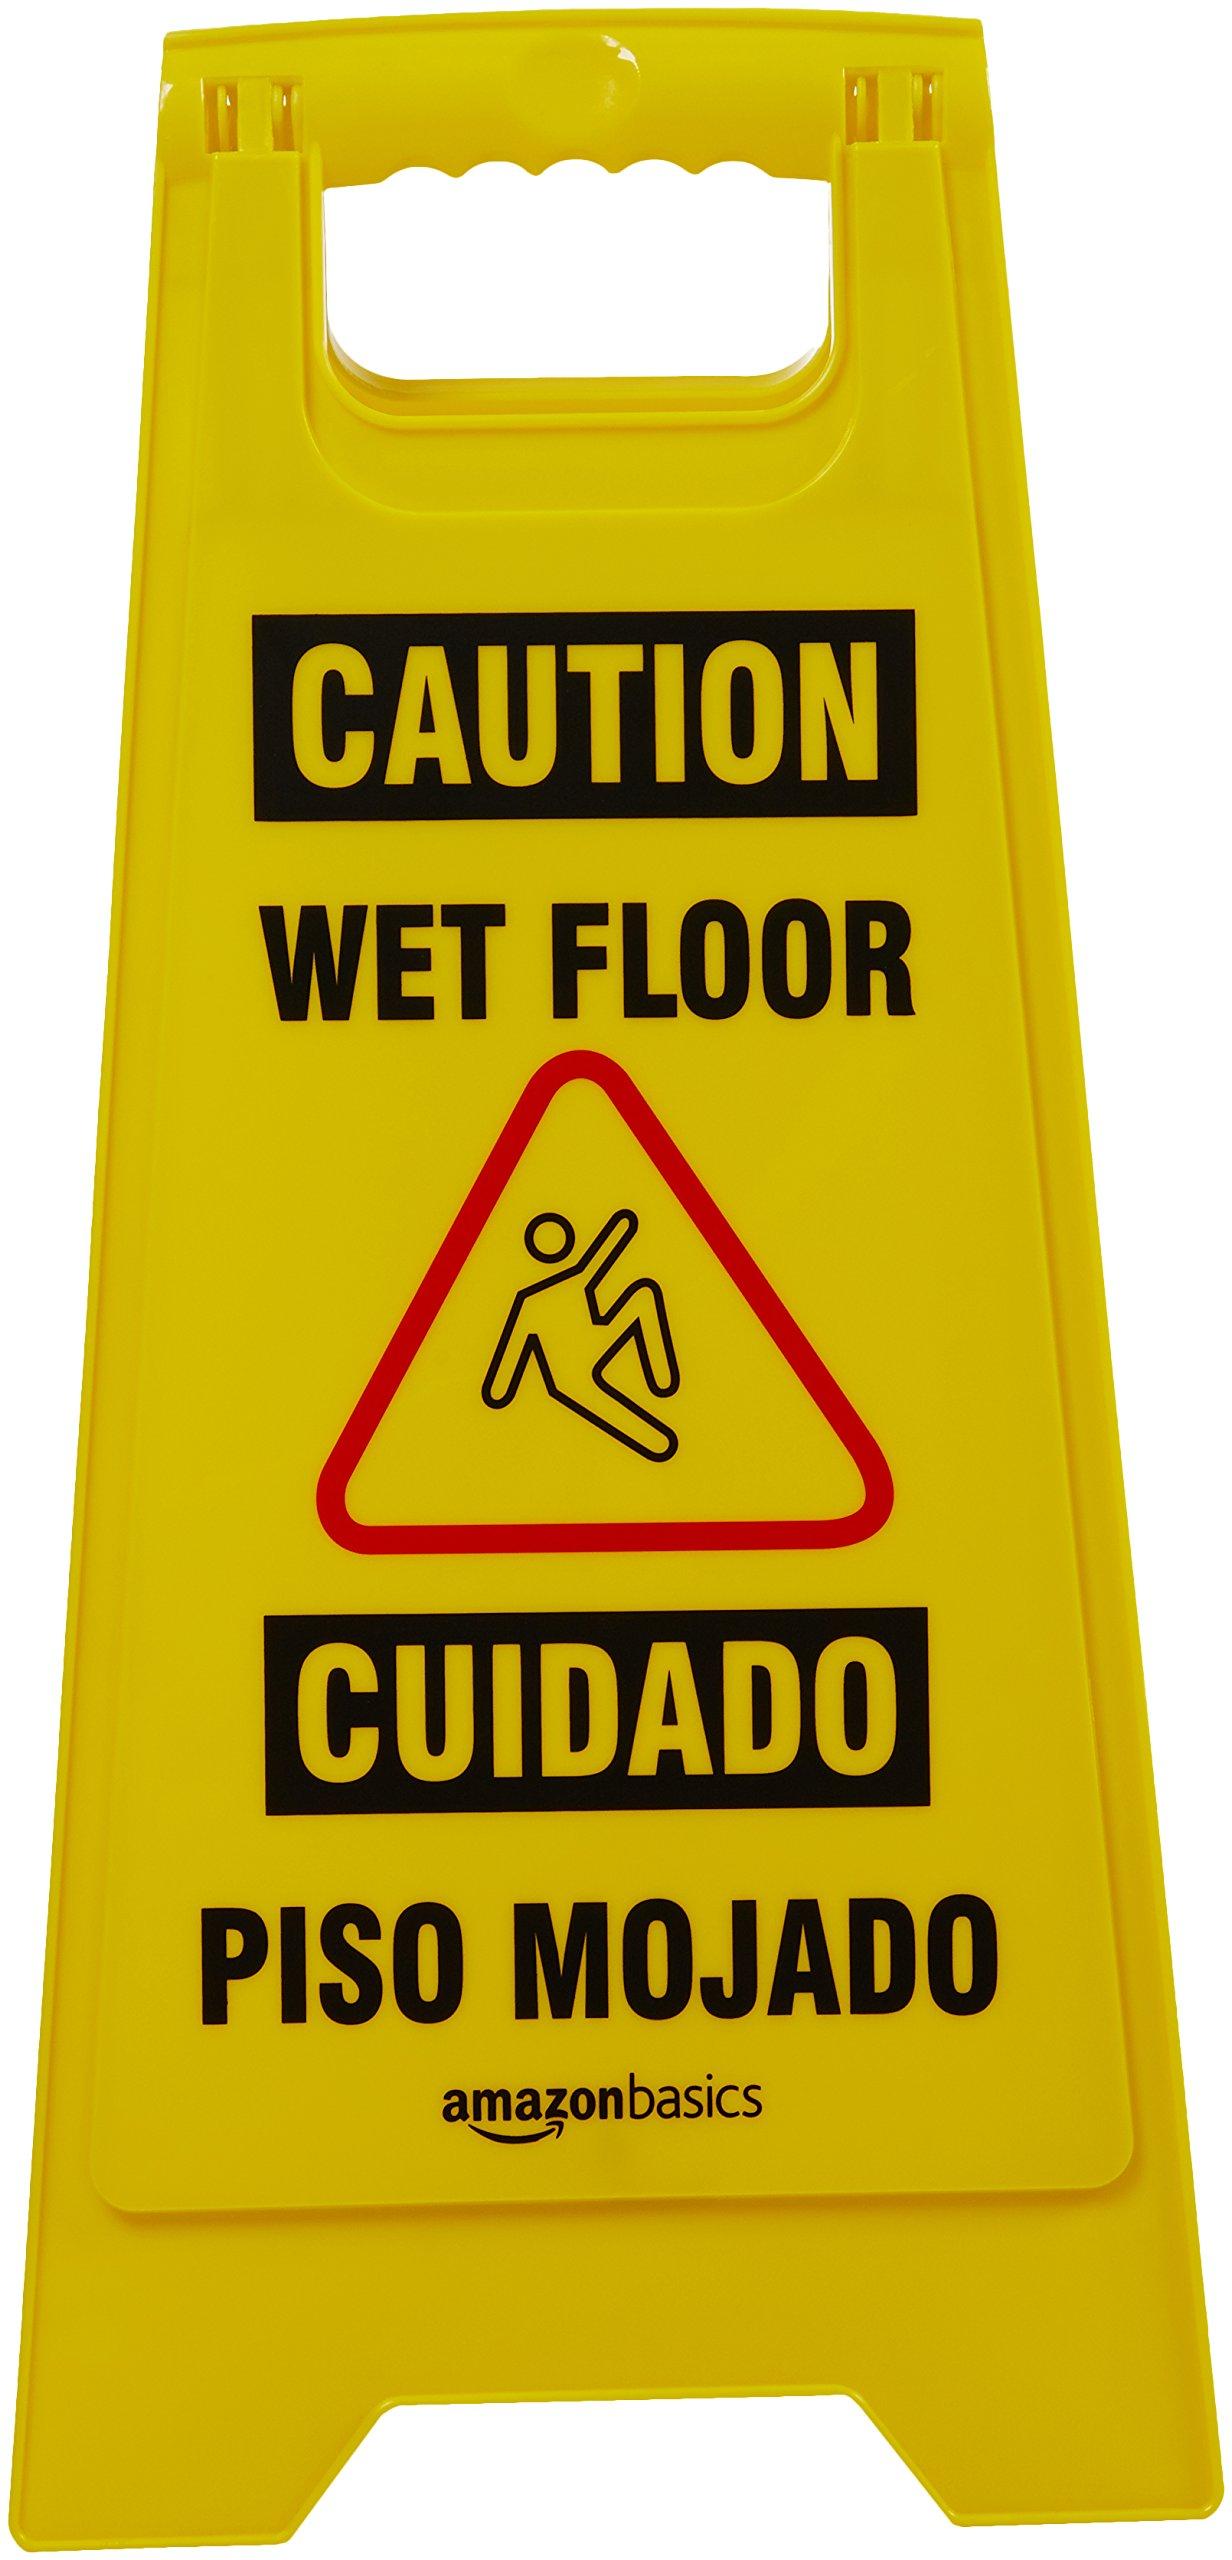 AmazonBasics 2-Sided Floor Safety Sign - Caution Wet Floor, Bilingual - 6-Pack